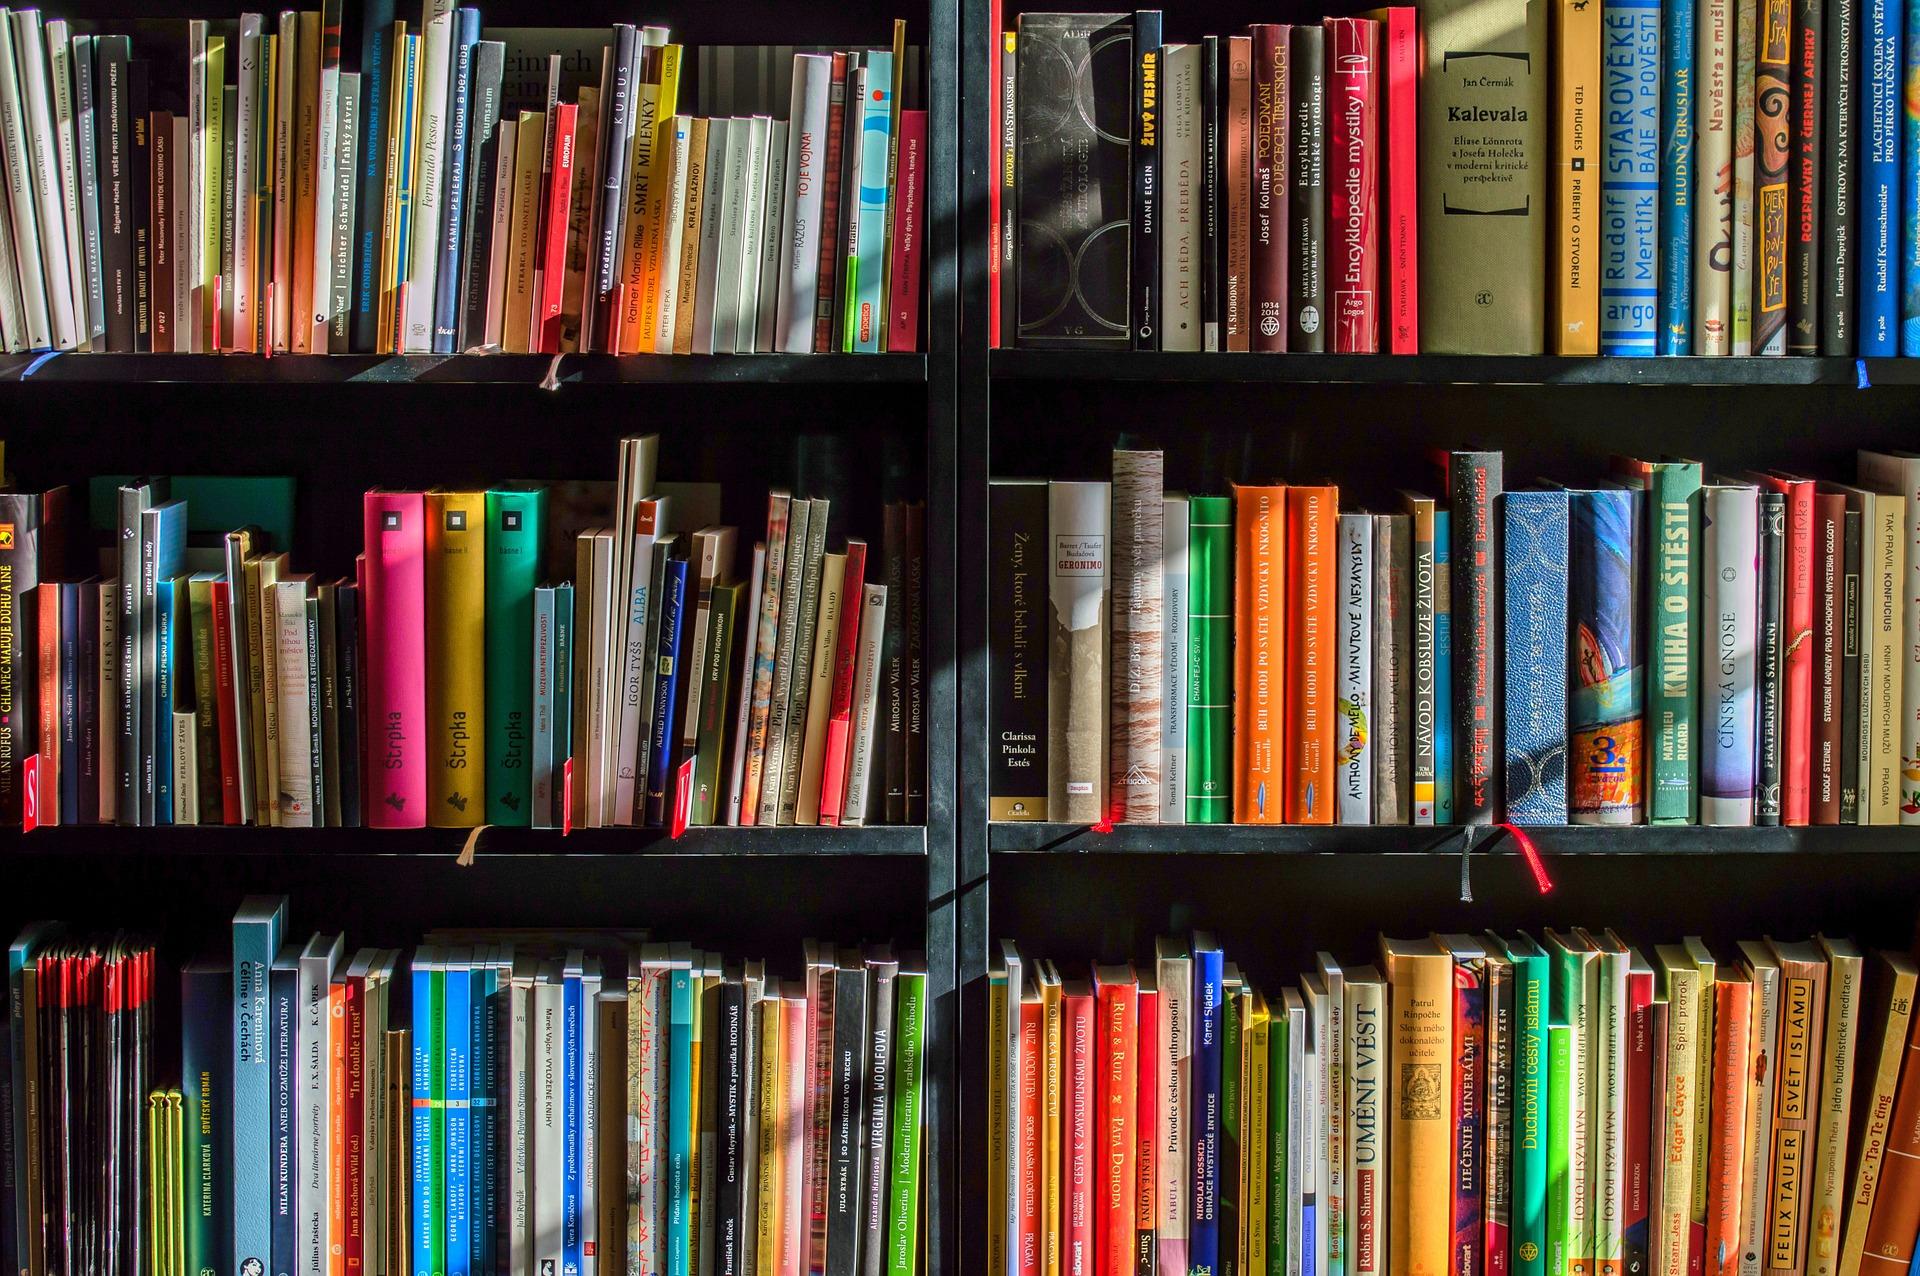 Lifelong Learning Scholarships